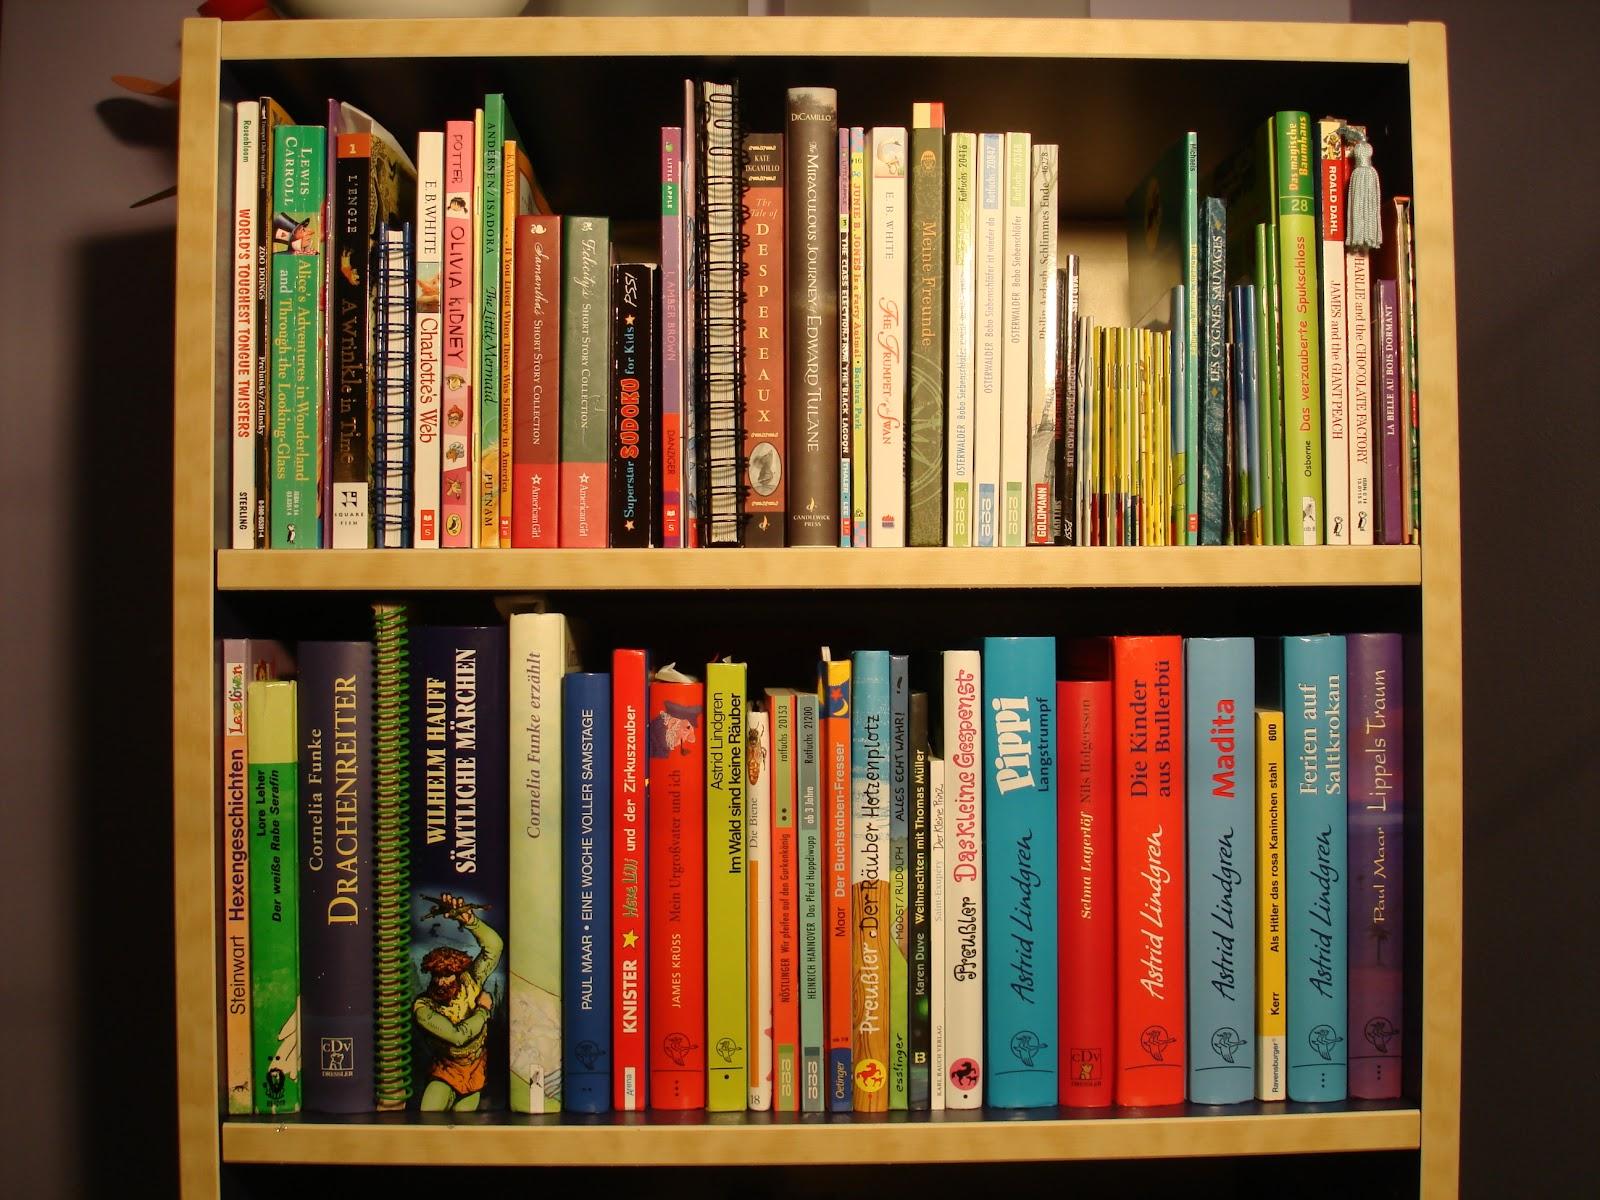 File:German American Kids Bookshelf.JPG - Wikimedia Commons